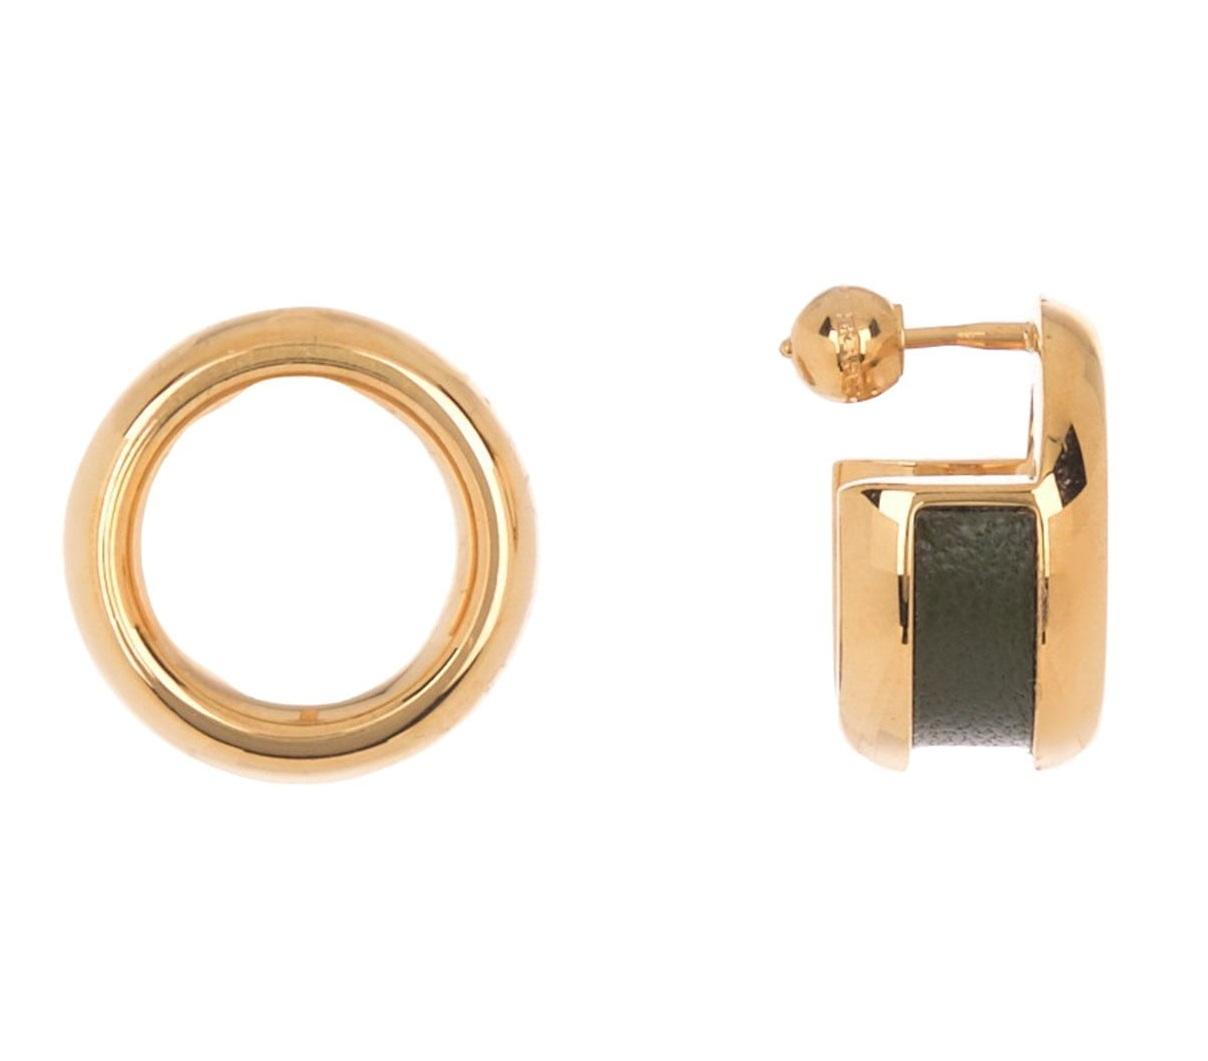 Burberry Leather & Bronze Grommet Hoop Earrings In Gold